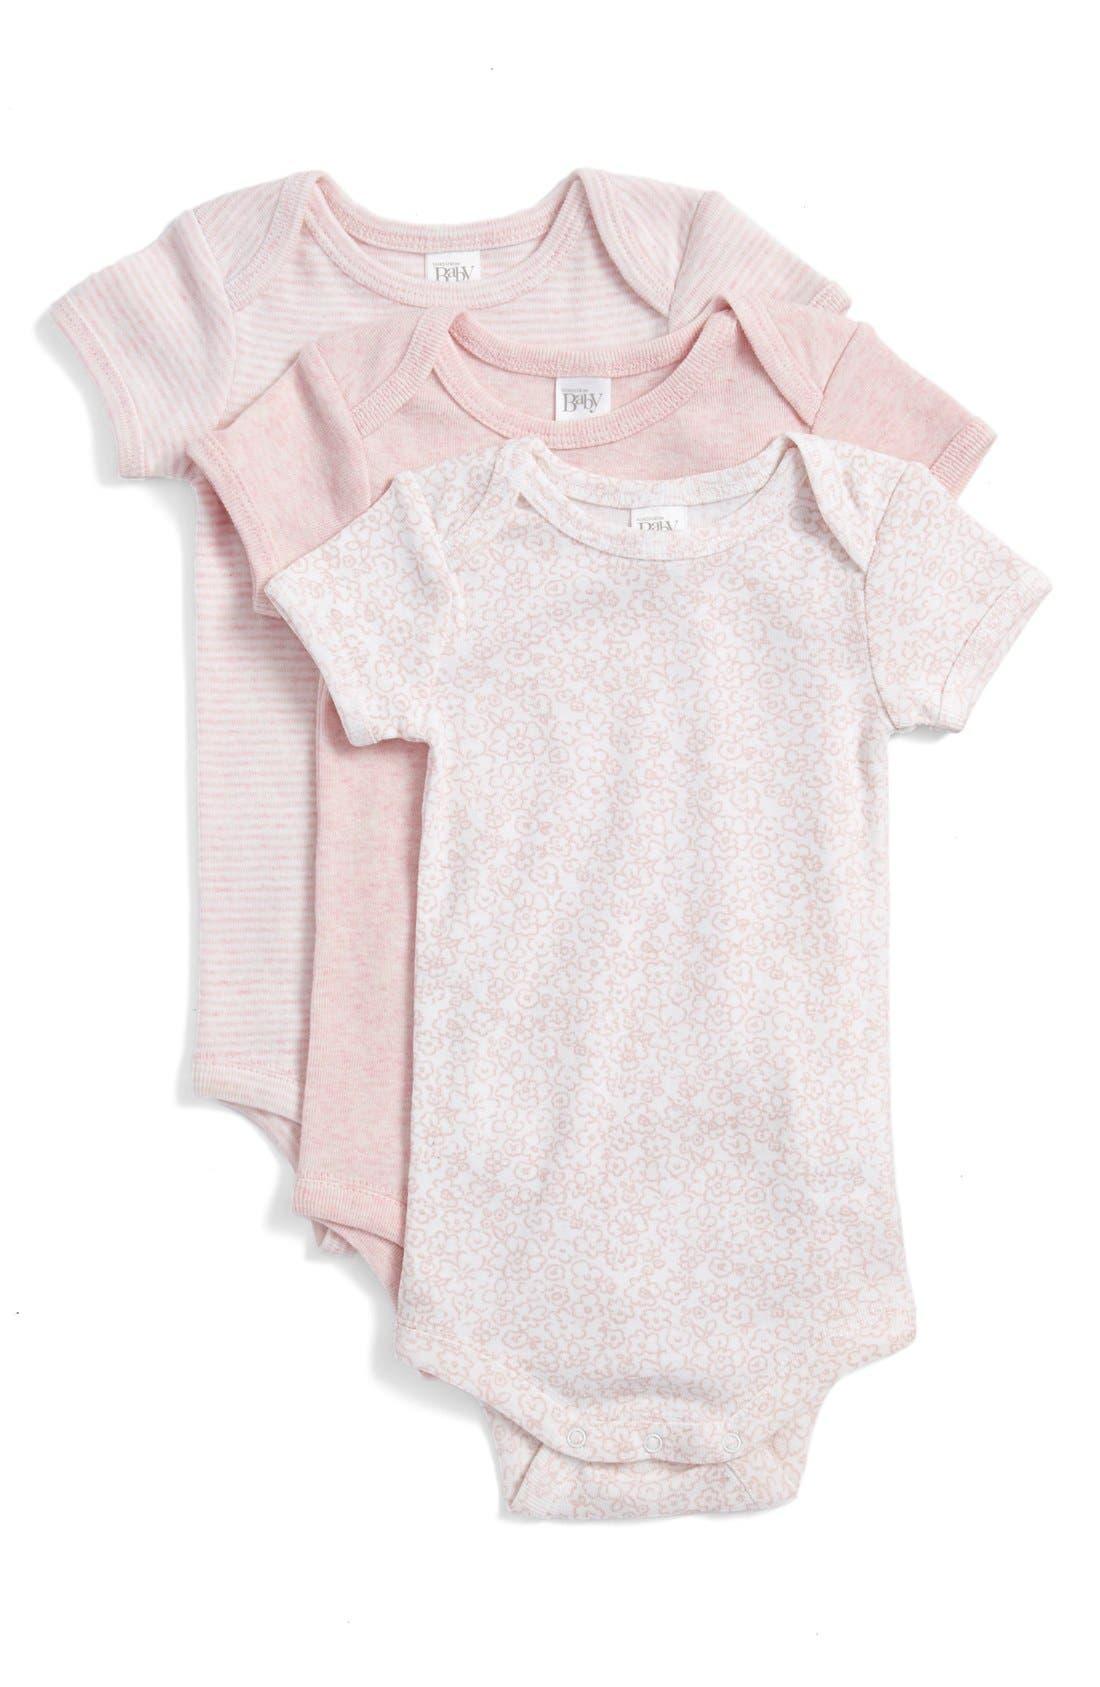 NORDSTROM BABY Short Sleeve Cotton Bodysuits